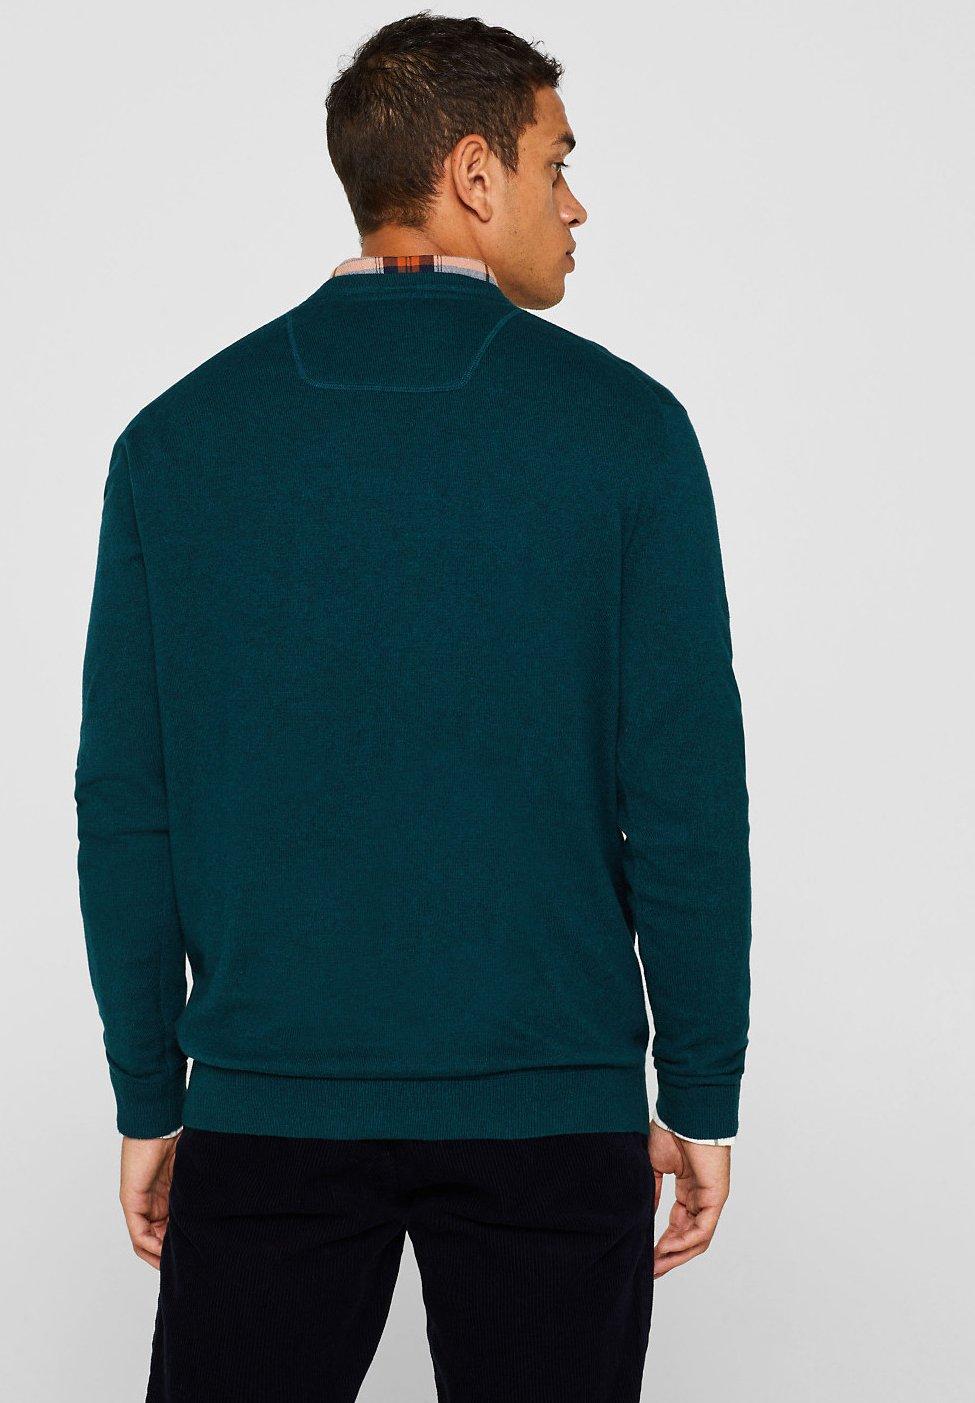 Esprit Strickpullover teal green